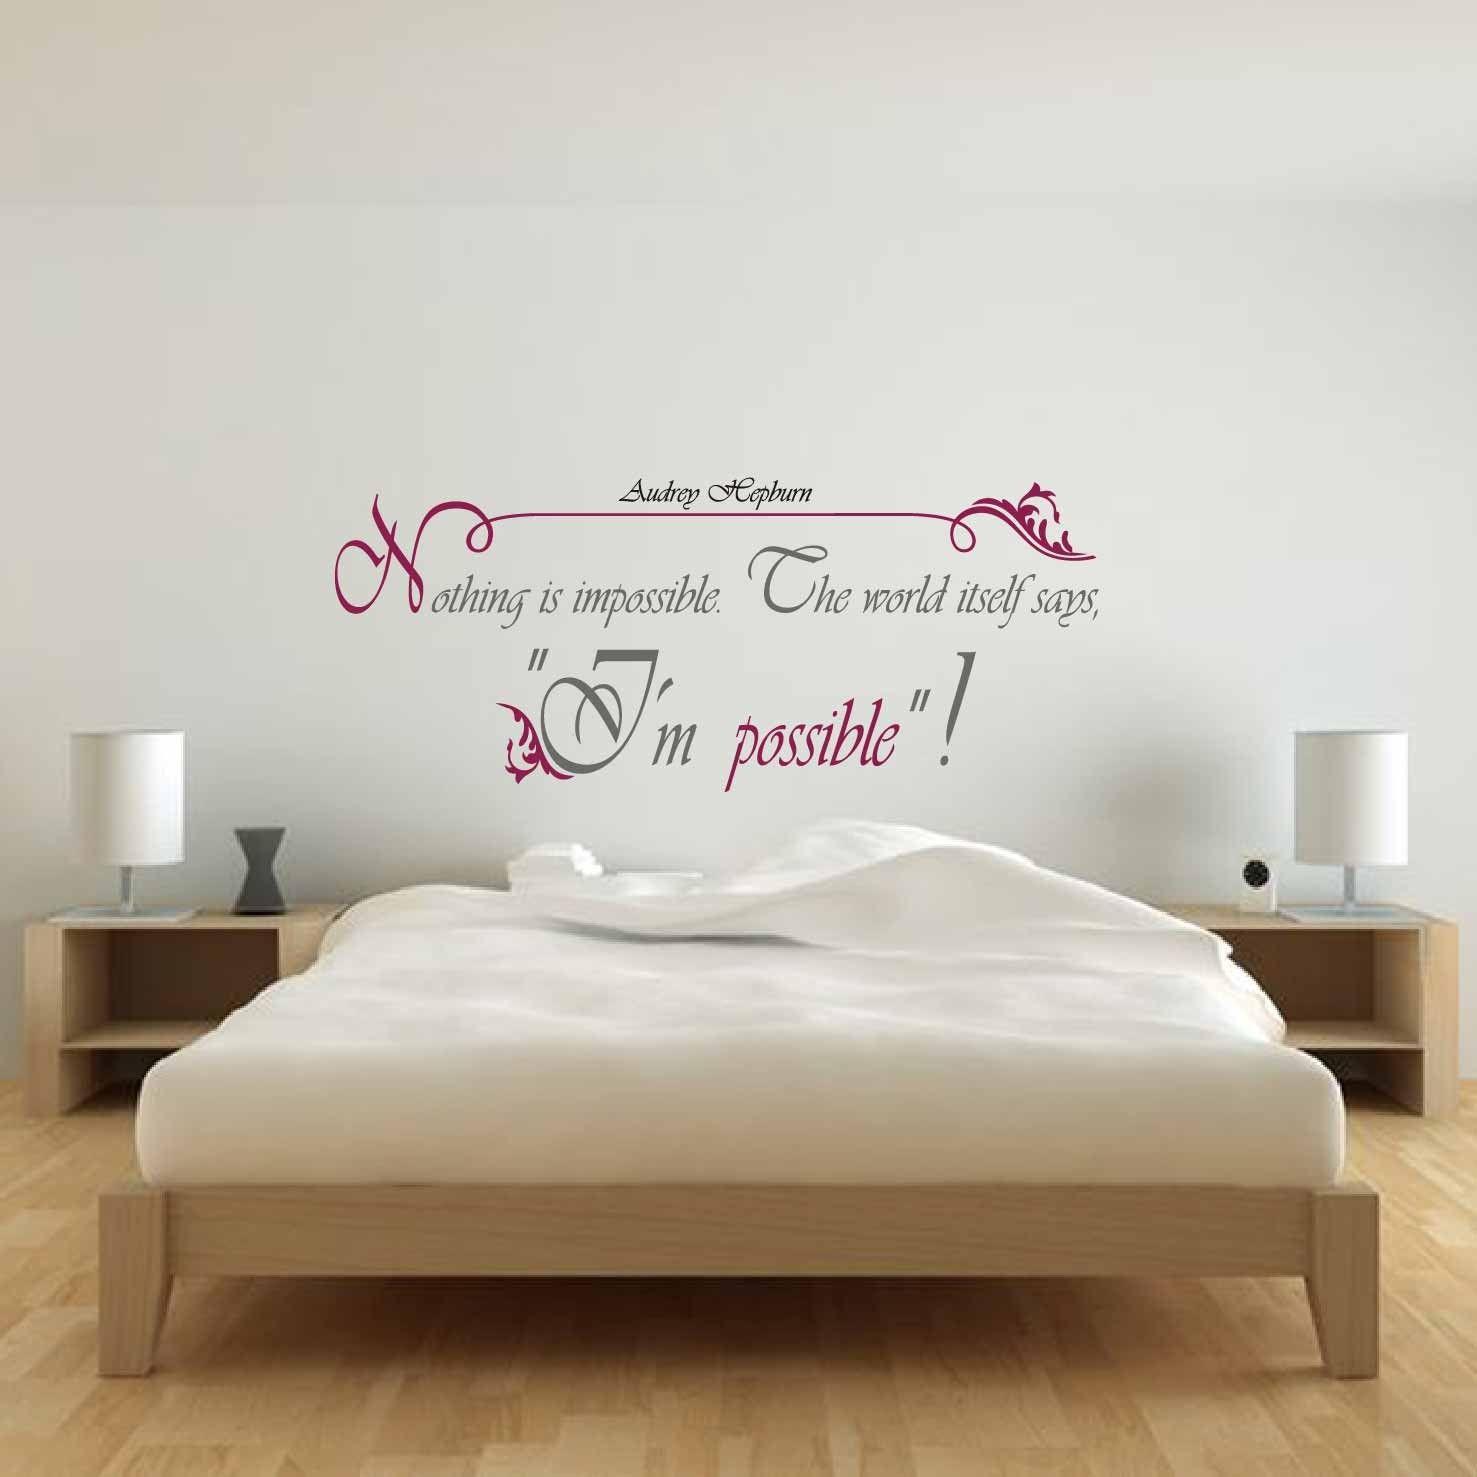 Vinilos decorativos cristianos buscar con google ideas for Vinilo para dormitorio adultos